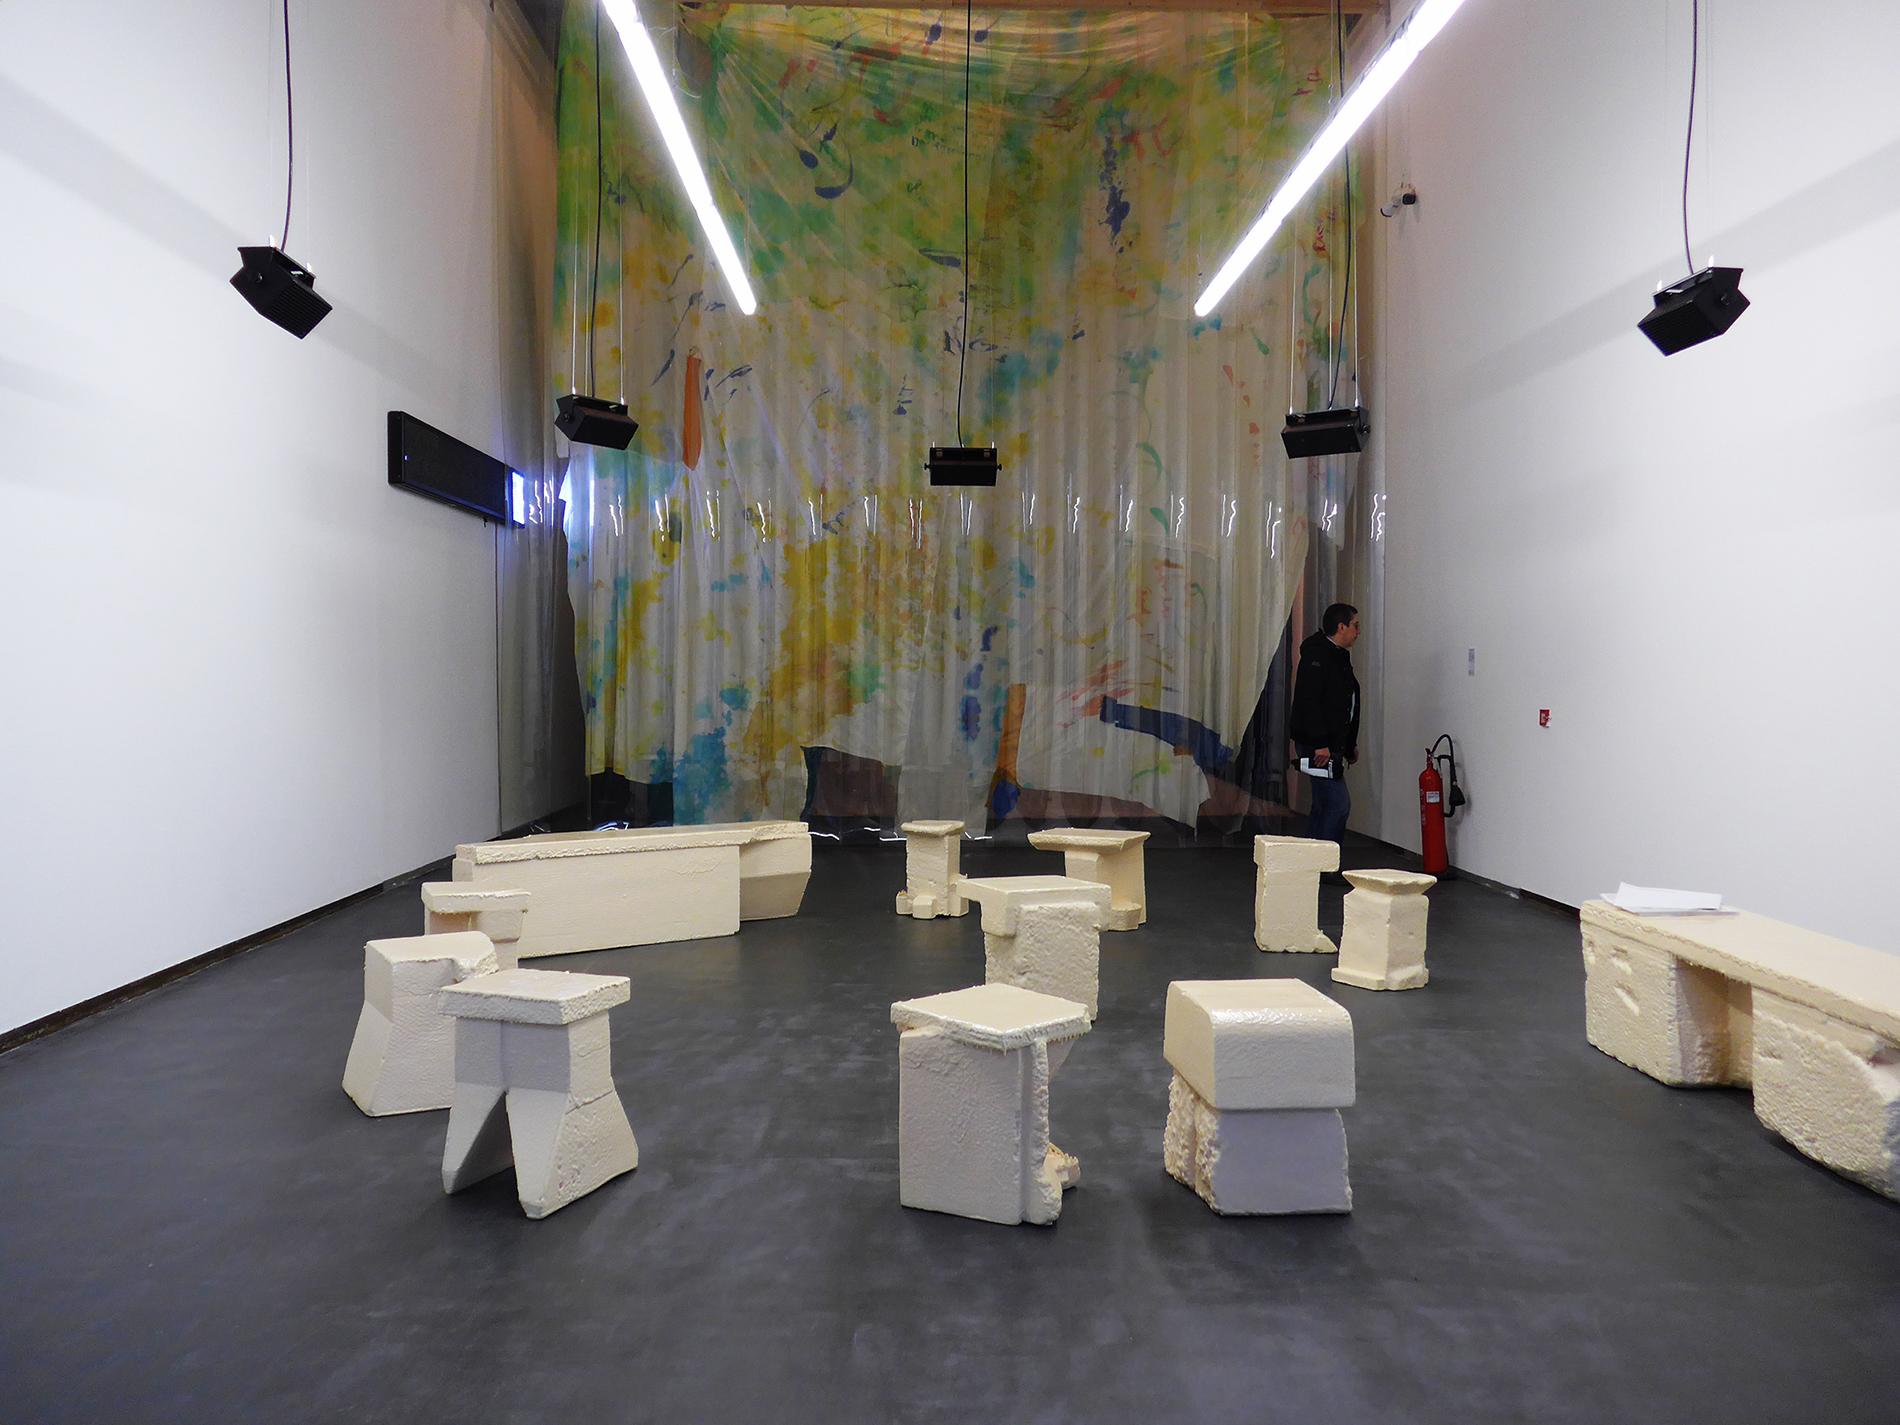 Ausstellungsansicht, Metamorfosi, Castello di Rivoli, Simon Battisti, Leah Whitman-Salkin, Äbäke, I Have Left You The Mountain, 2016 (Foto: Barbara Fässler)